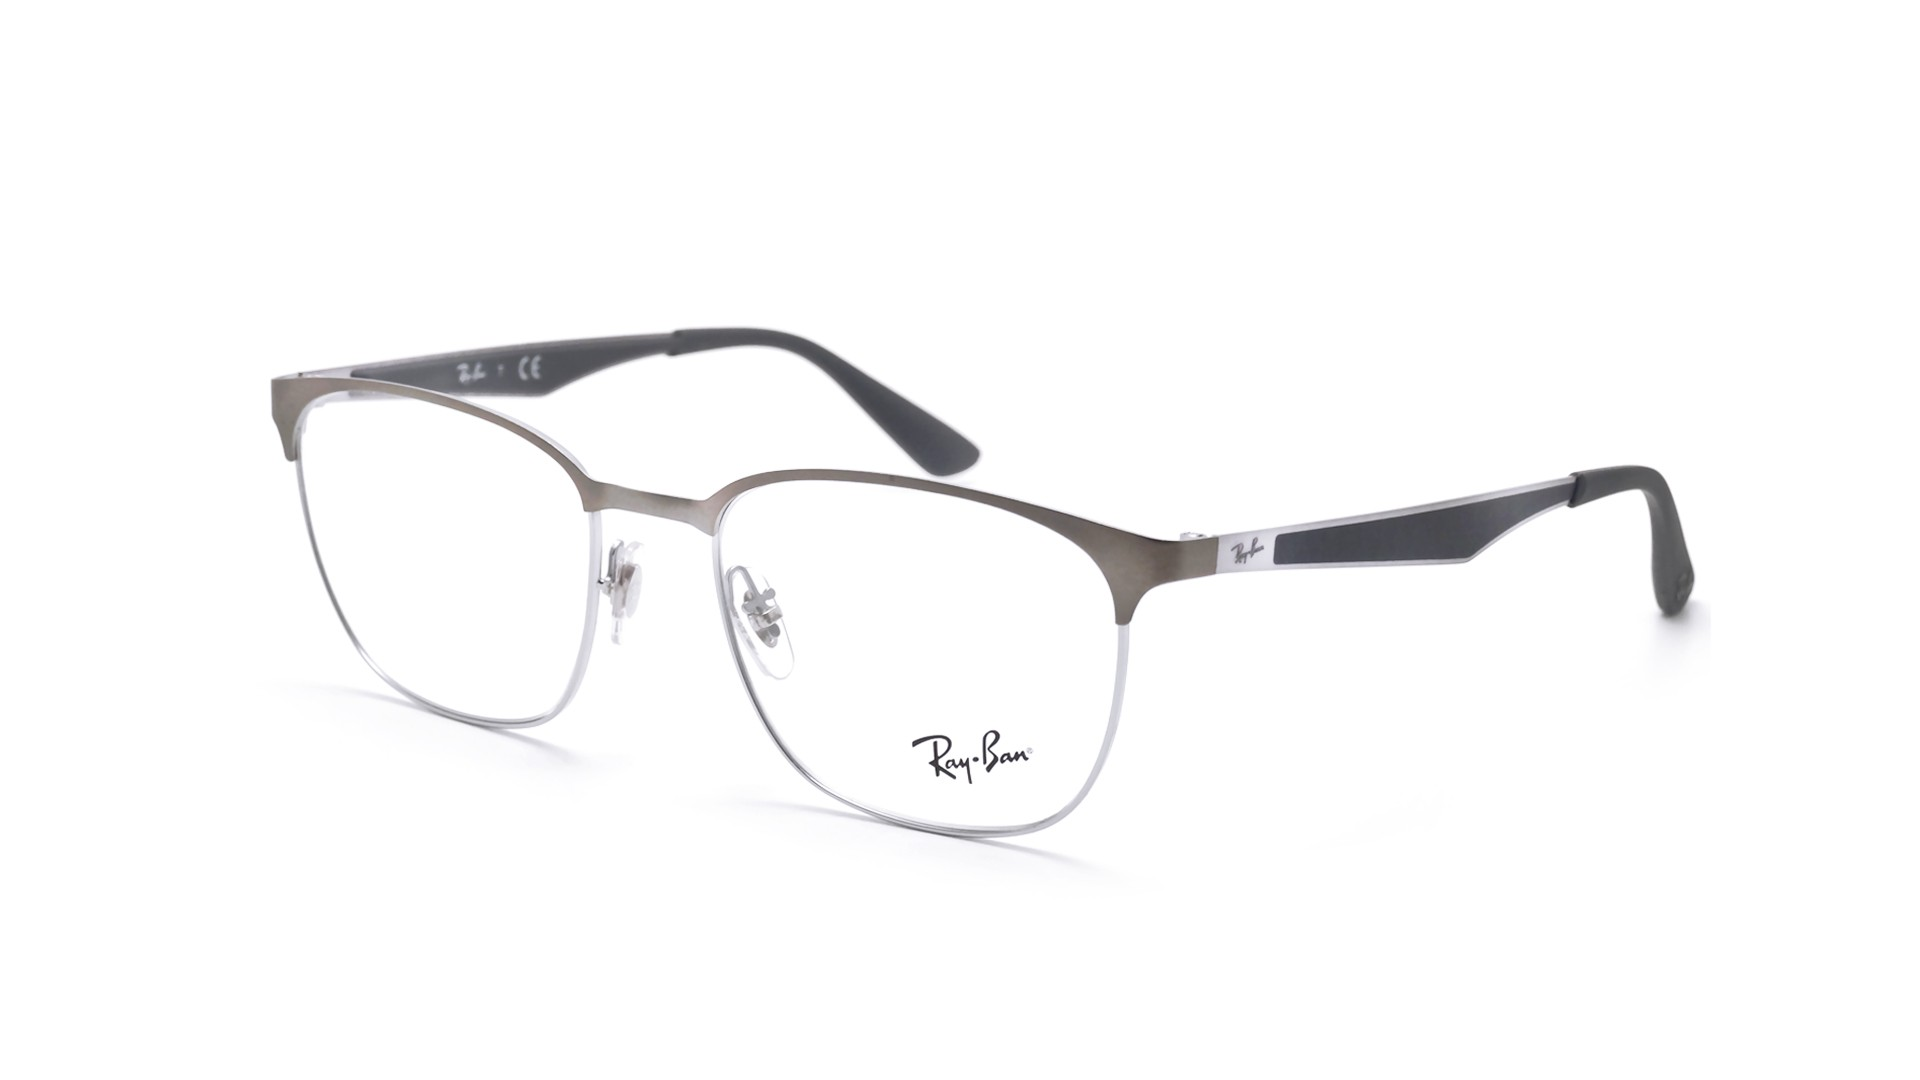 51efb59bbc6 Eyeglasses Ray-Ban Clubmaster Silver Mat RX6356 RB6356 2874 52-18 Large